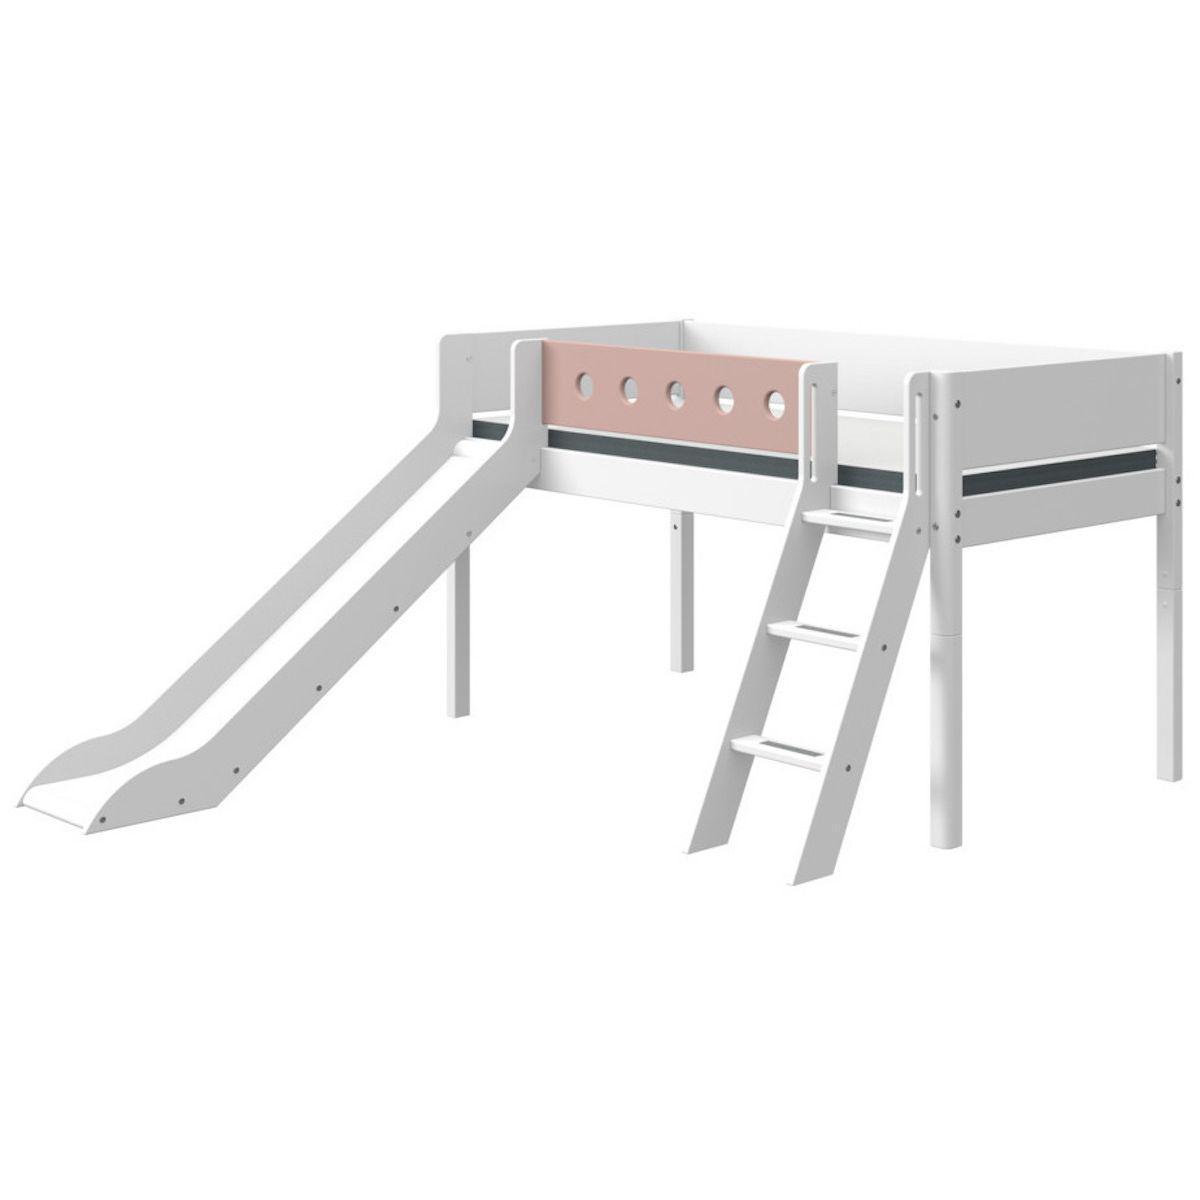 Cama media alta 90x190cm escalera inclinada-tobogán WHITE Flexa blanco-rosa claro